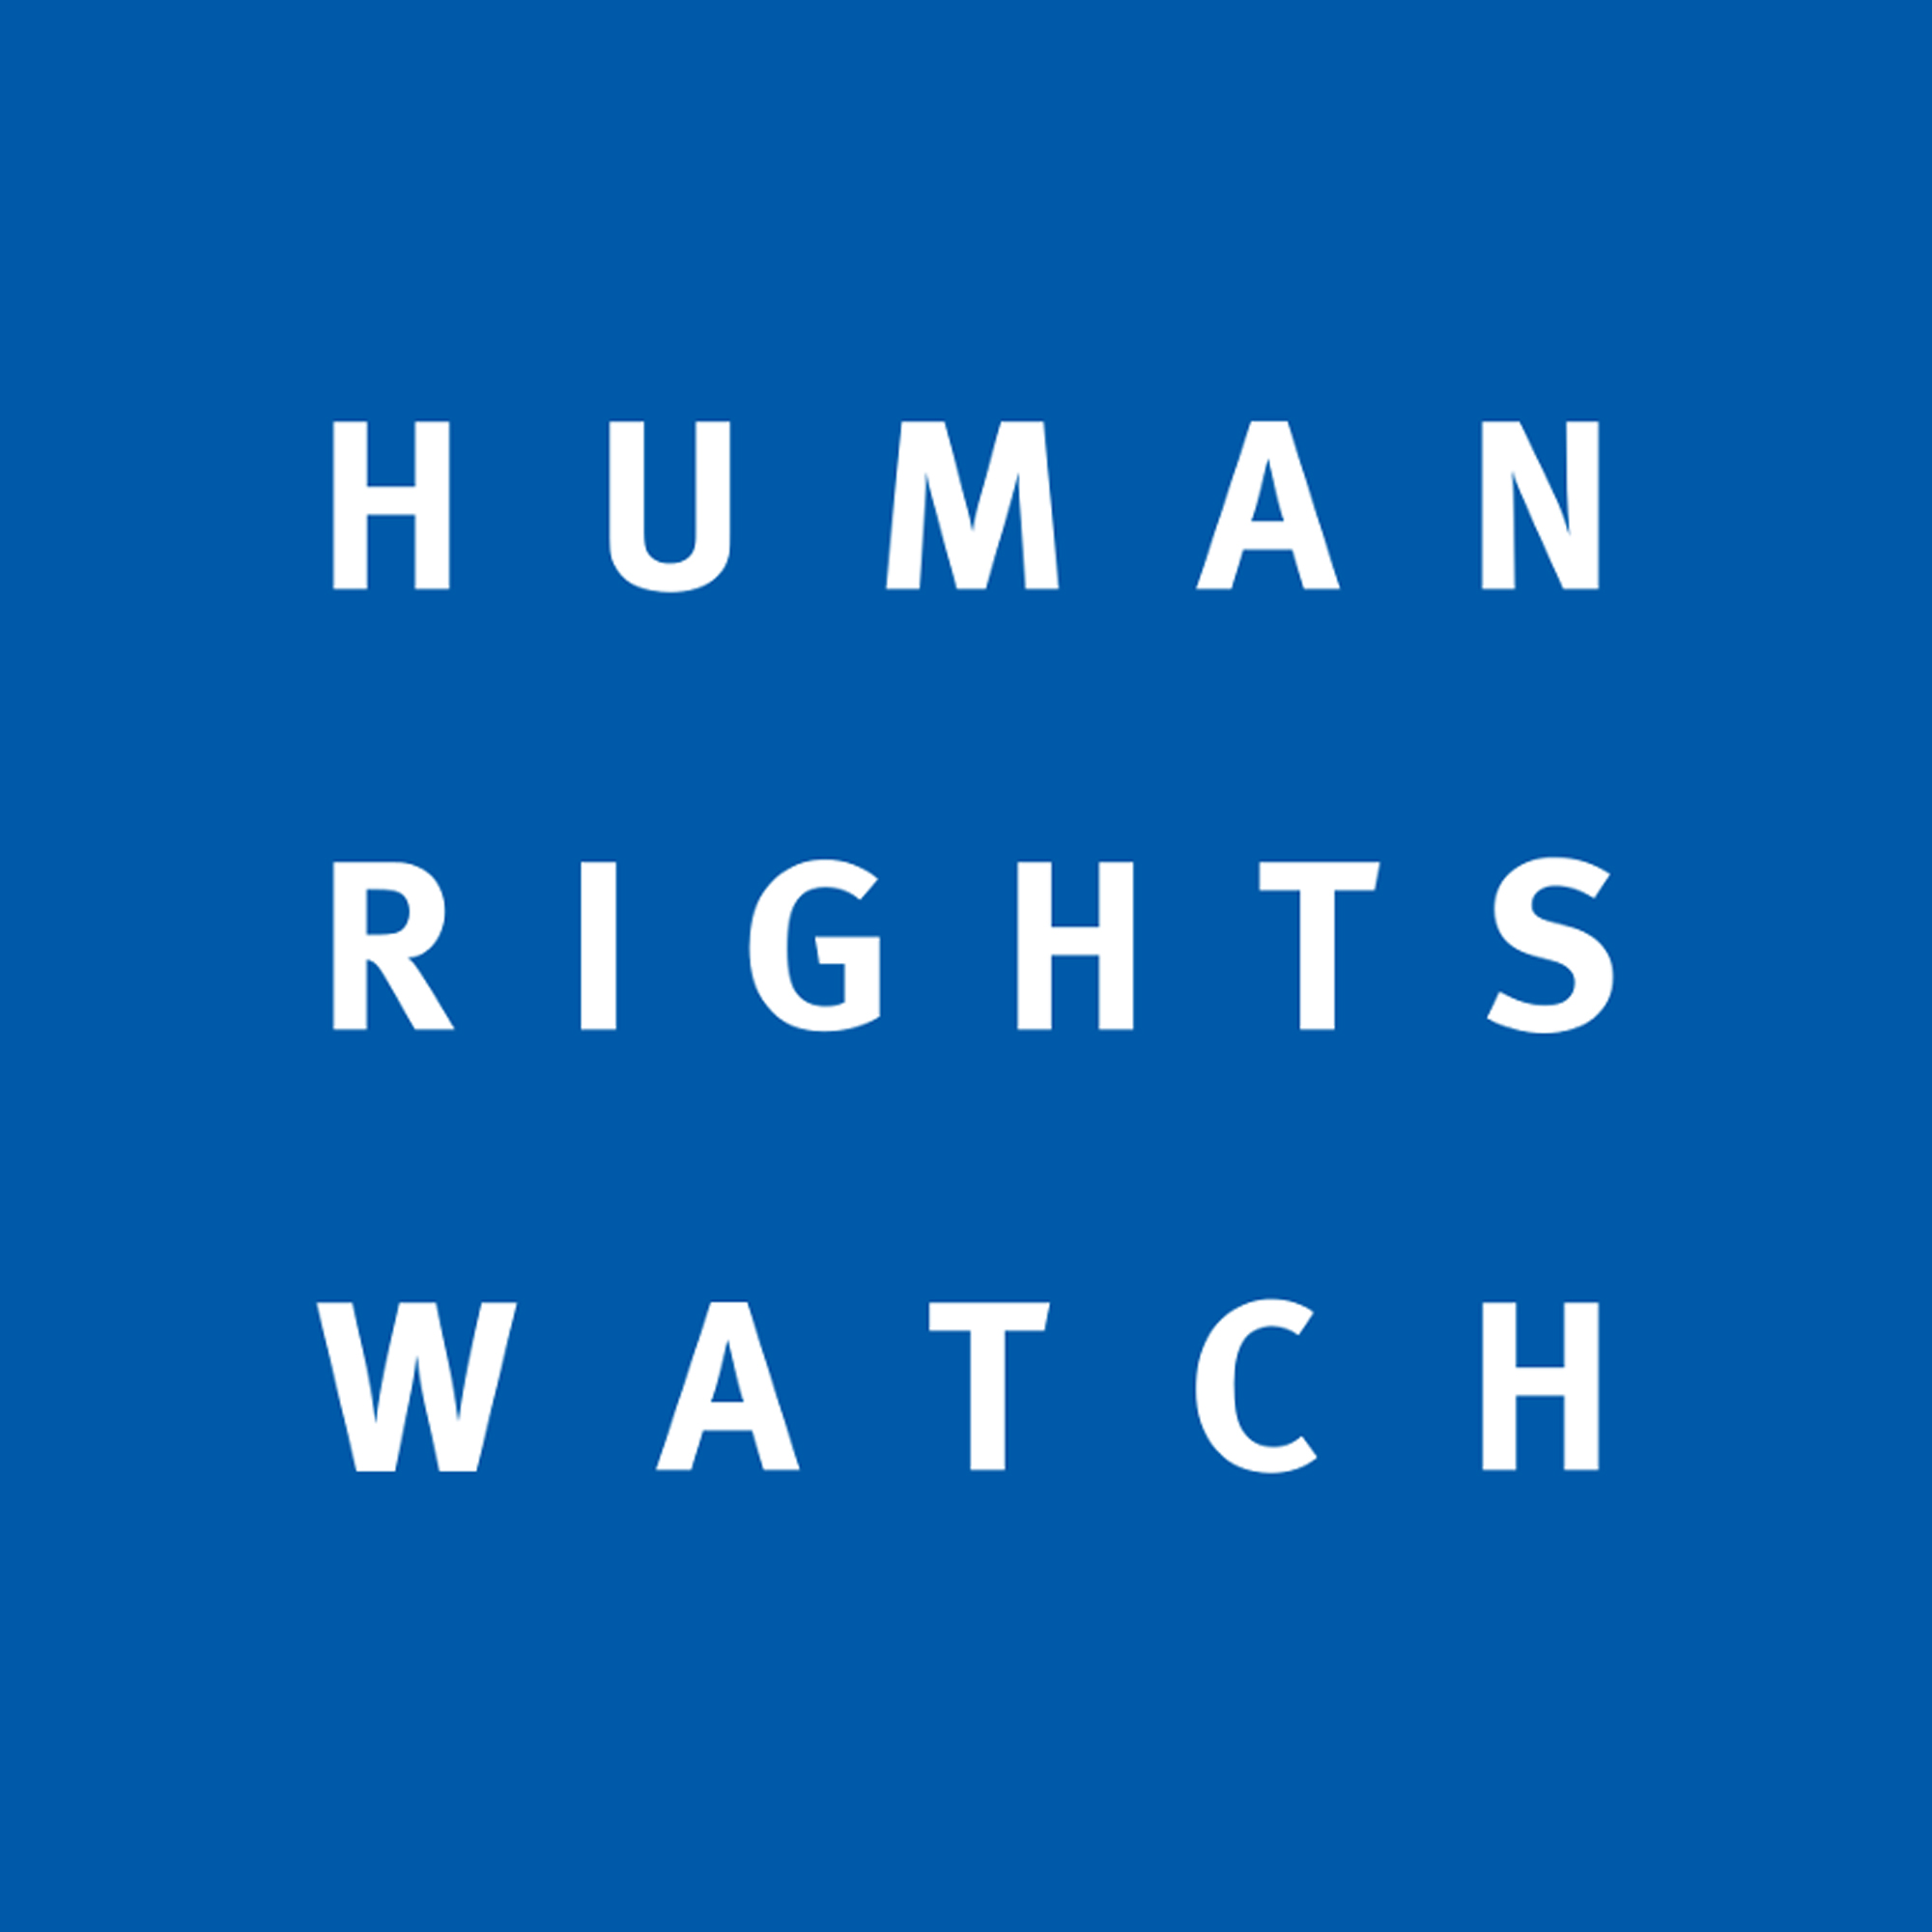 Хьюман Райтс Вотч (Human Rights Watch)